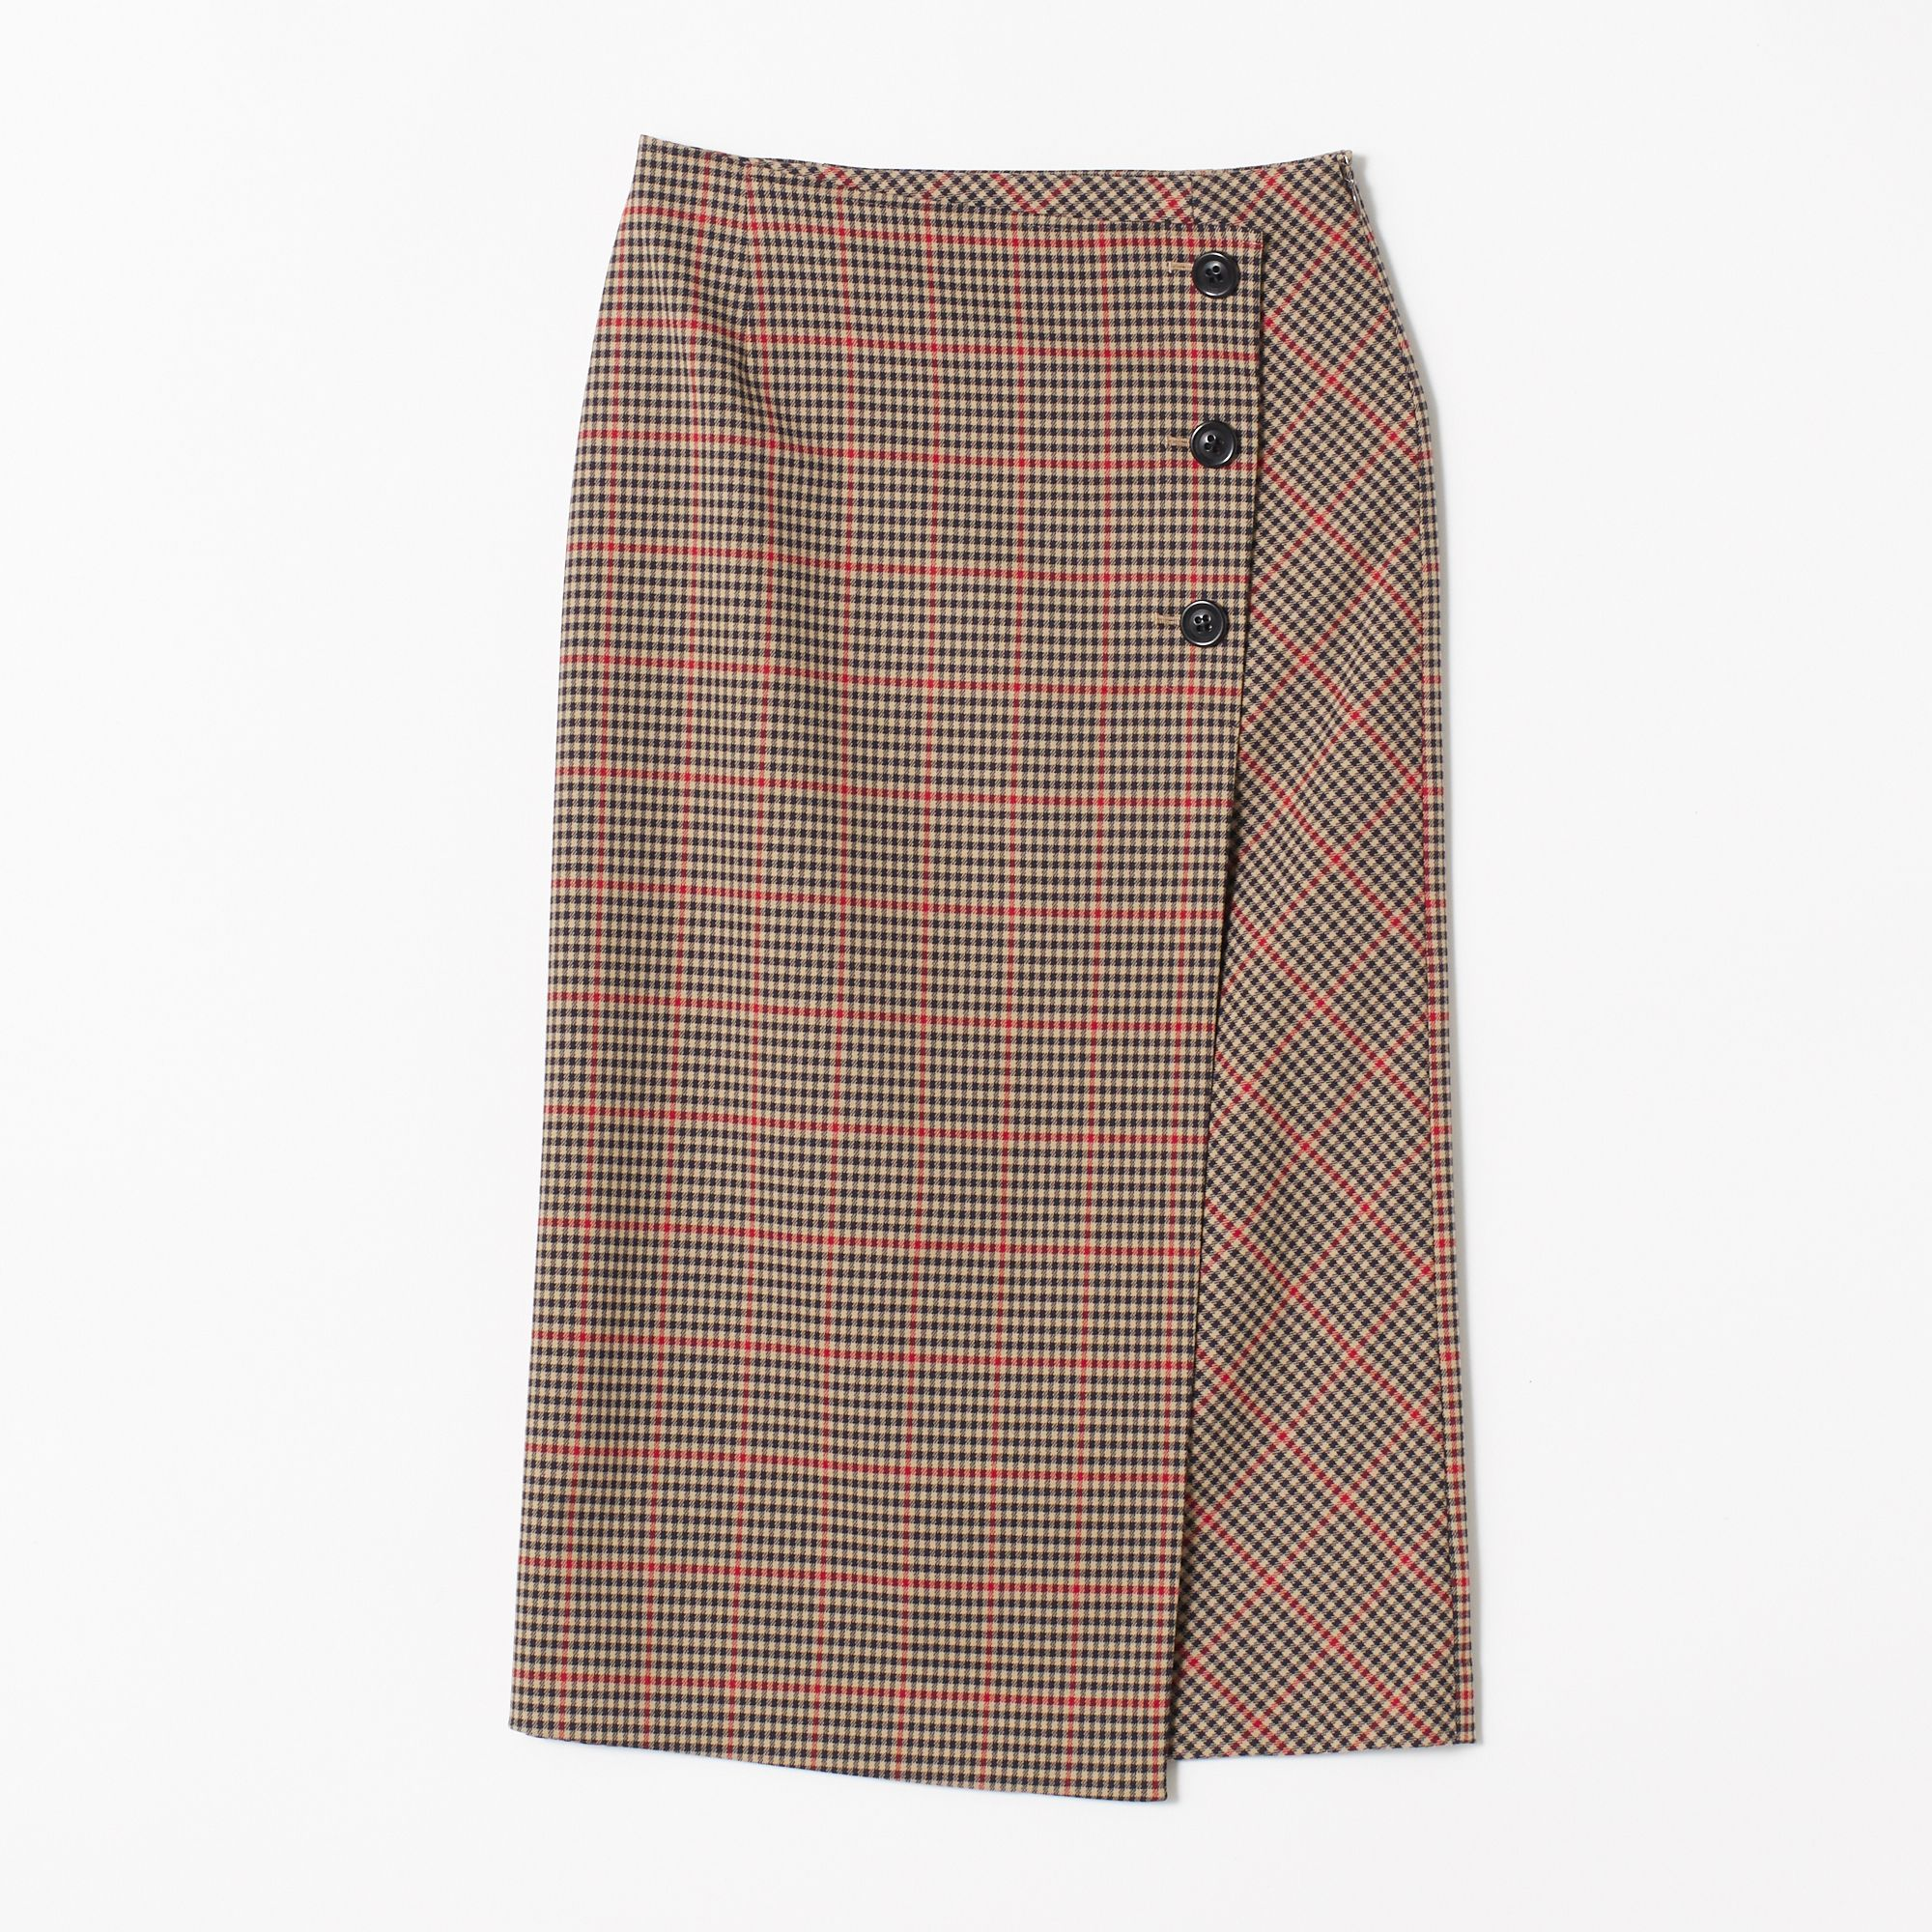 M7daysエムセブンデイズ/チェック柄タイトスカート